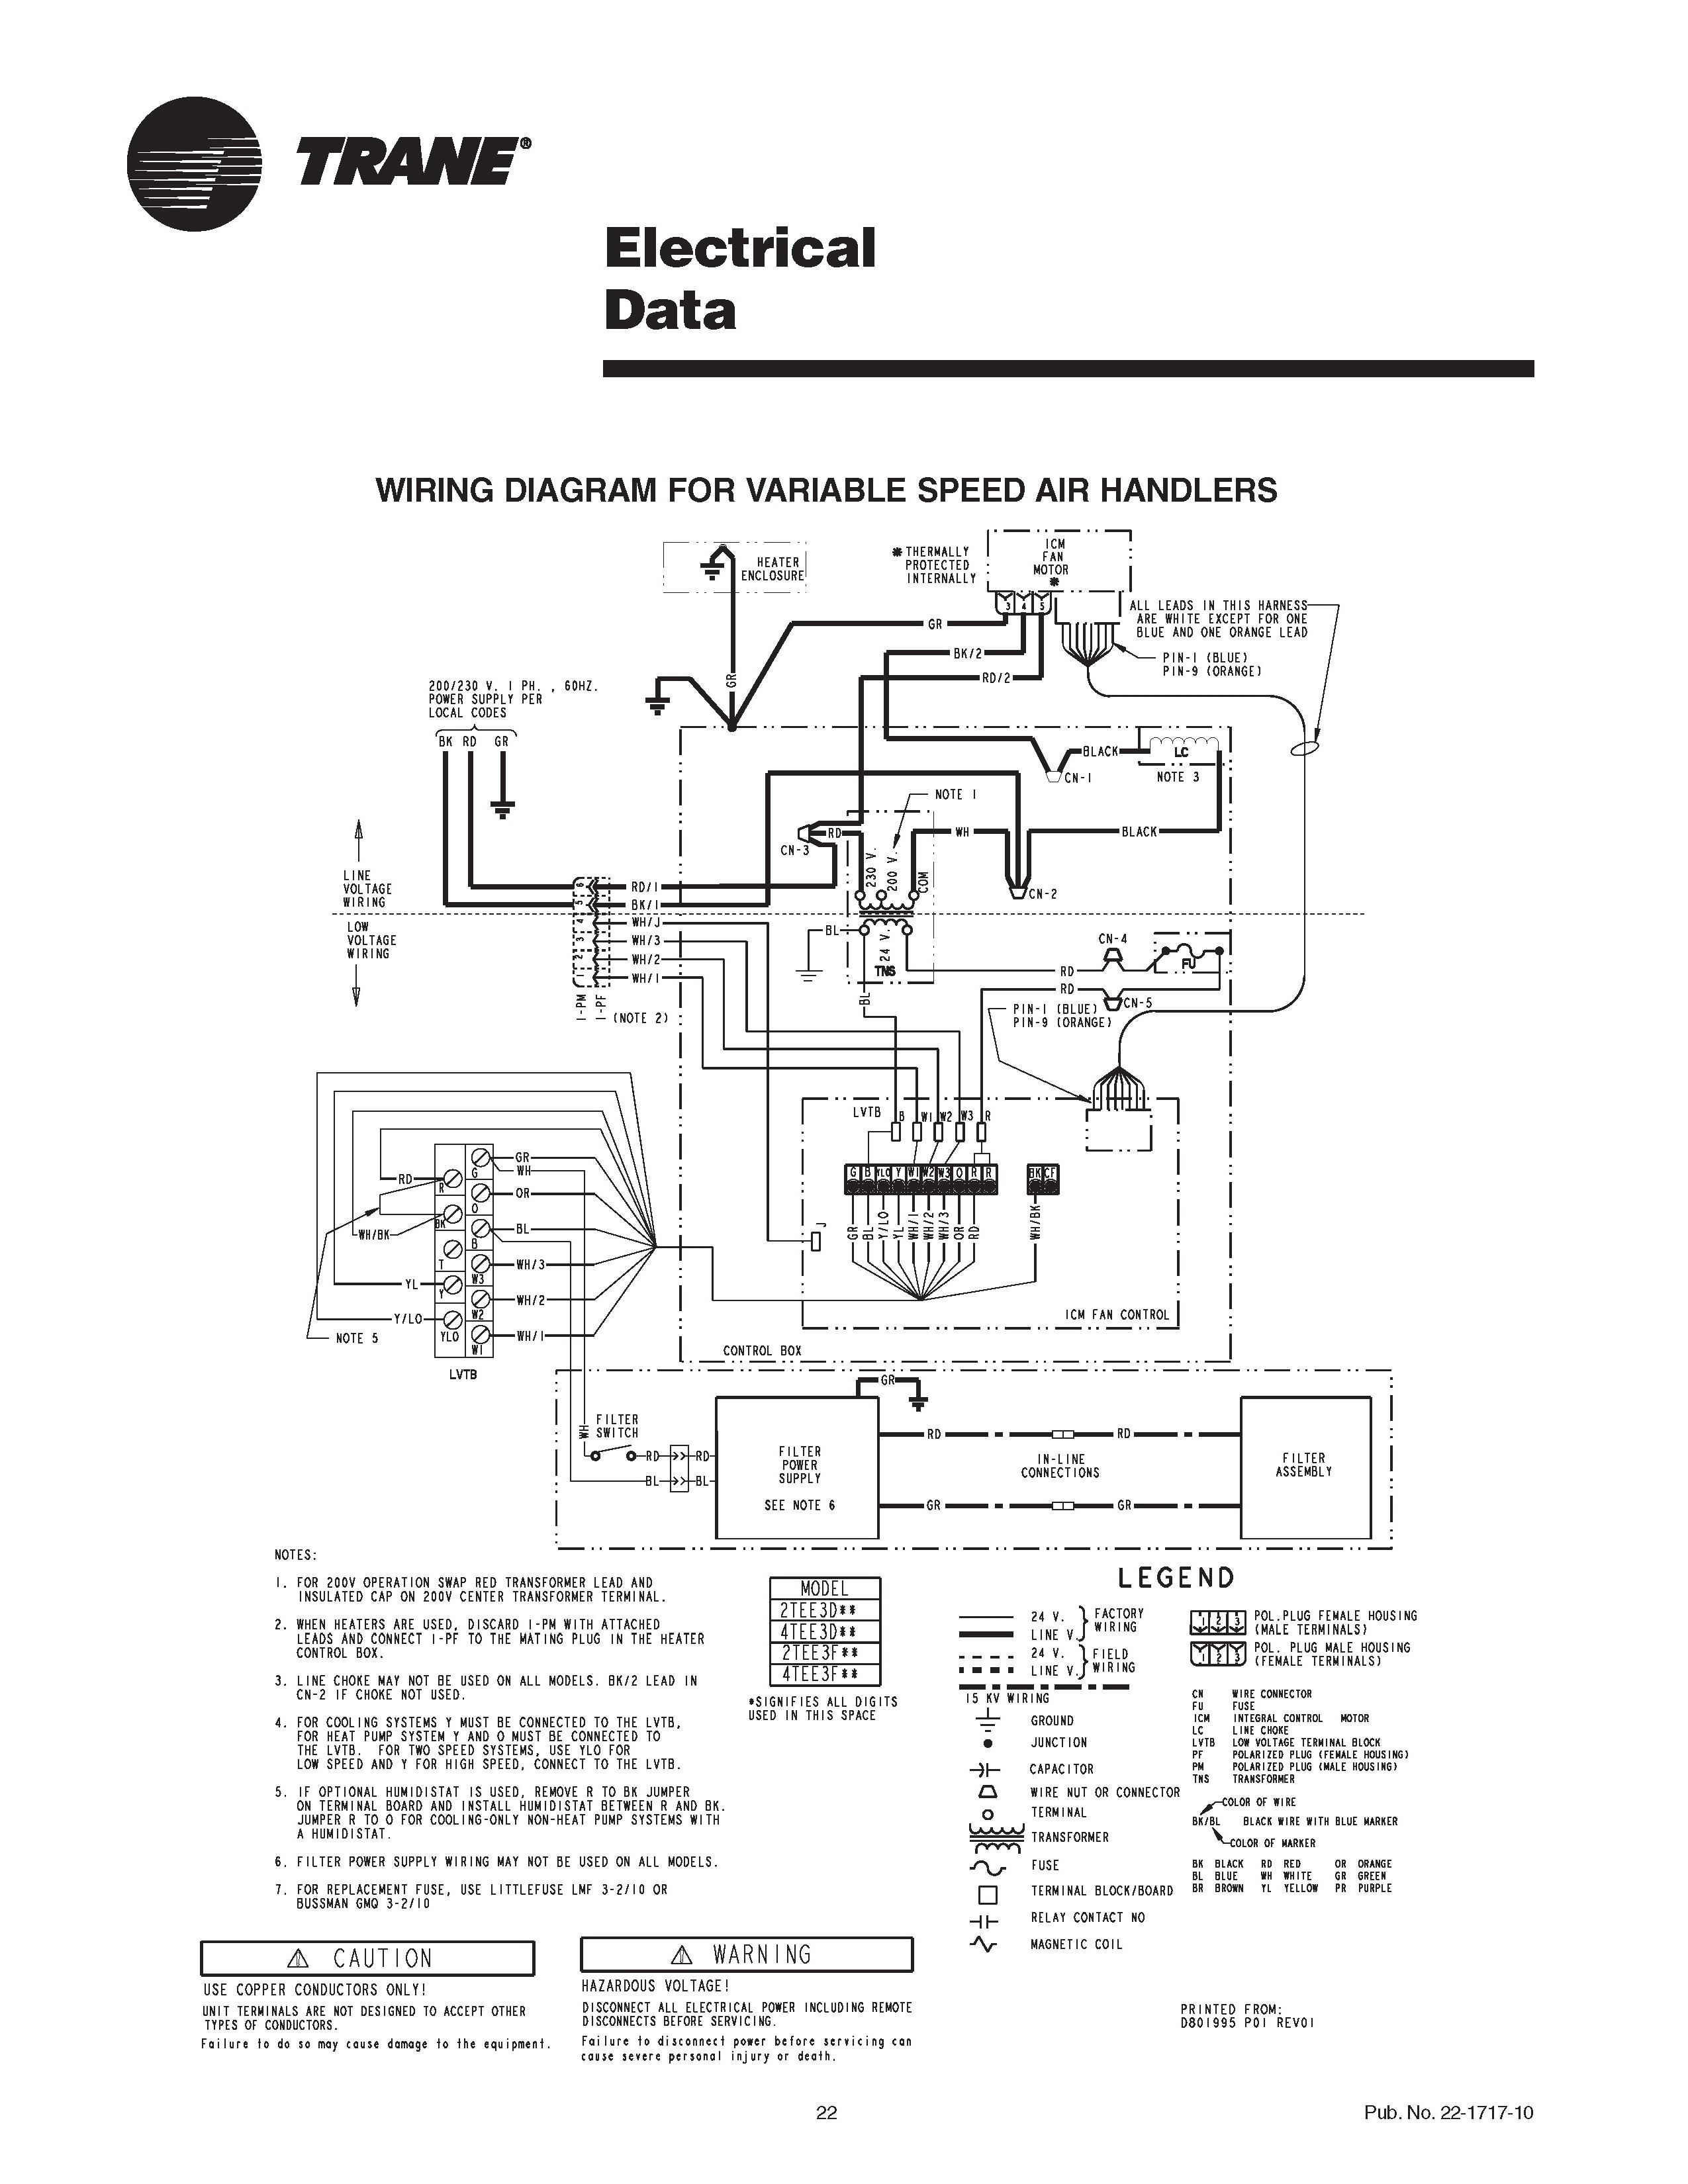 trane air conditioner wiring diagram bargman 7 pin diagrams handler gam5 best